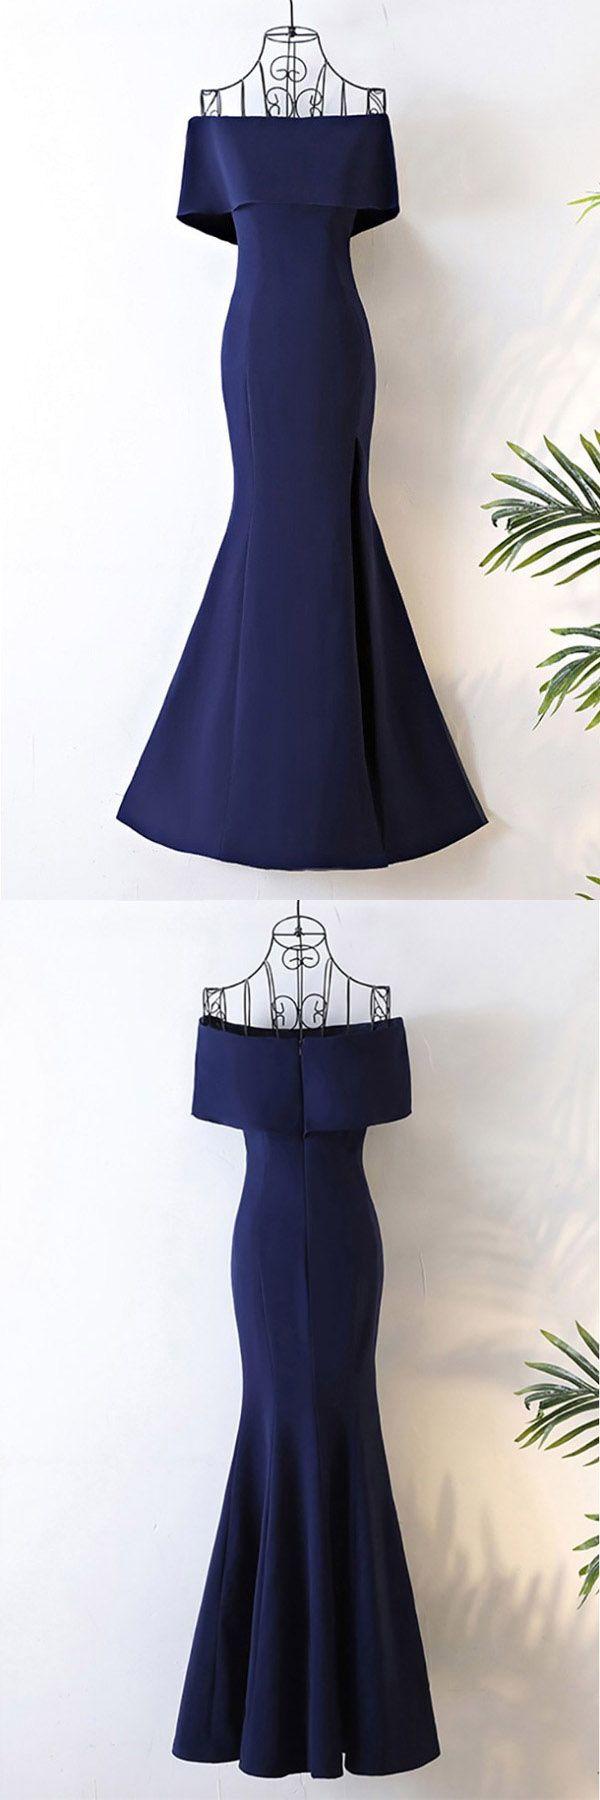 Long Navy Blue Satin Mermaid Forma/Prom Dress Off The Shoulder PG613 #navyblue #mermaid #dress #promdress #promgown #eveninggown #eveningdress #pgmdress #satin #newstyle